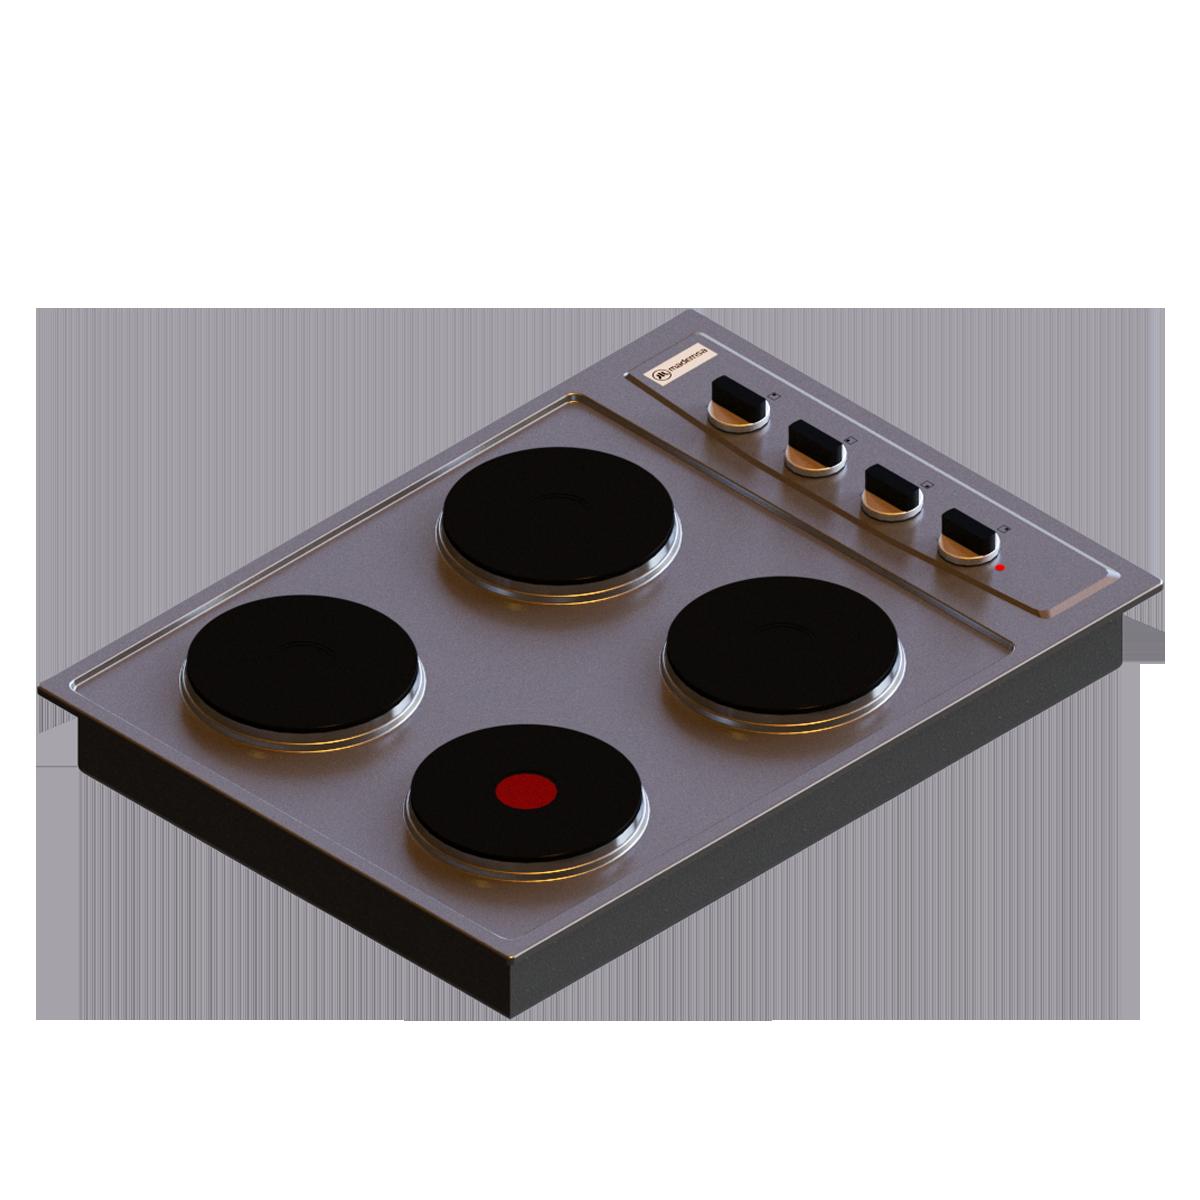 Encimera eléctrica MEE 4.5E Mademsa en BIM